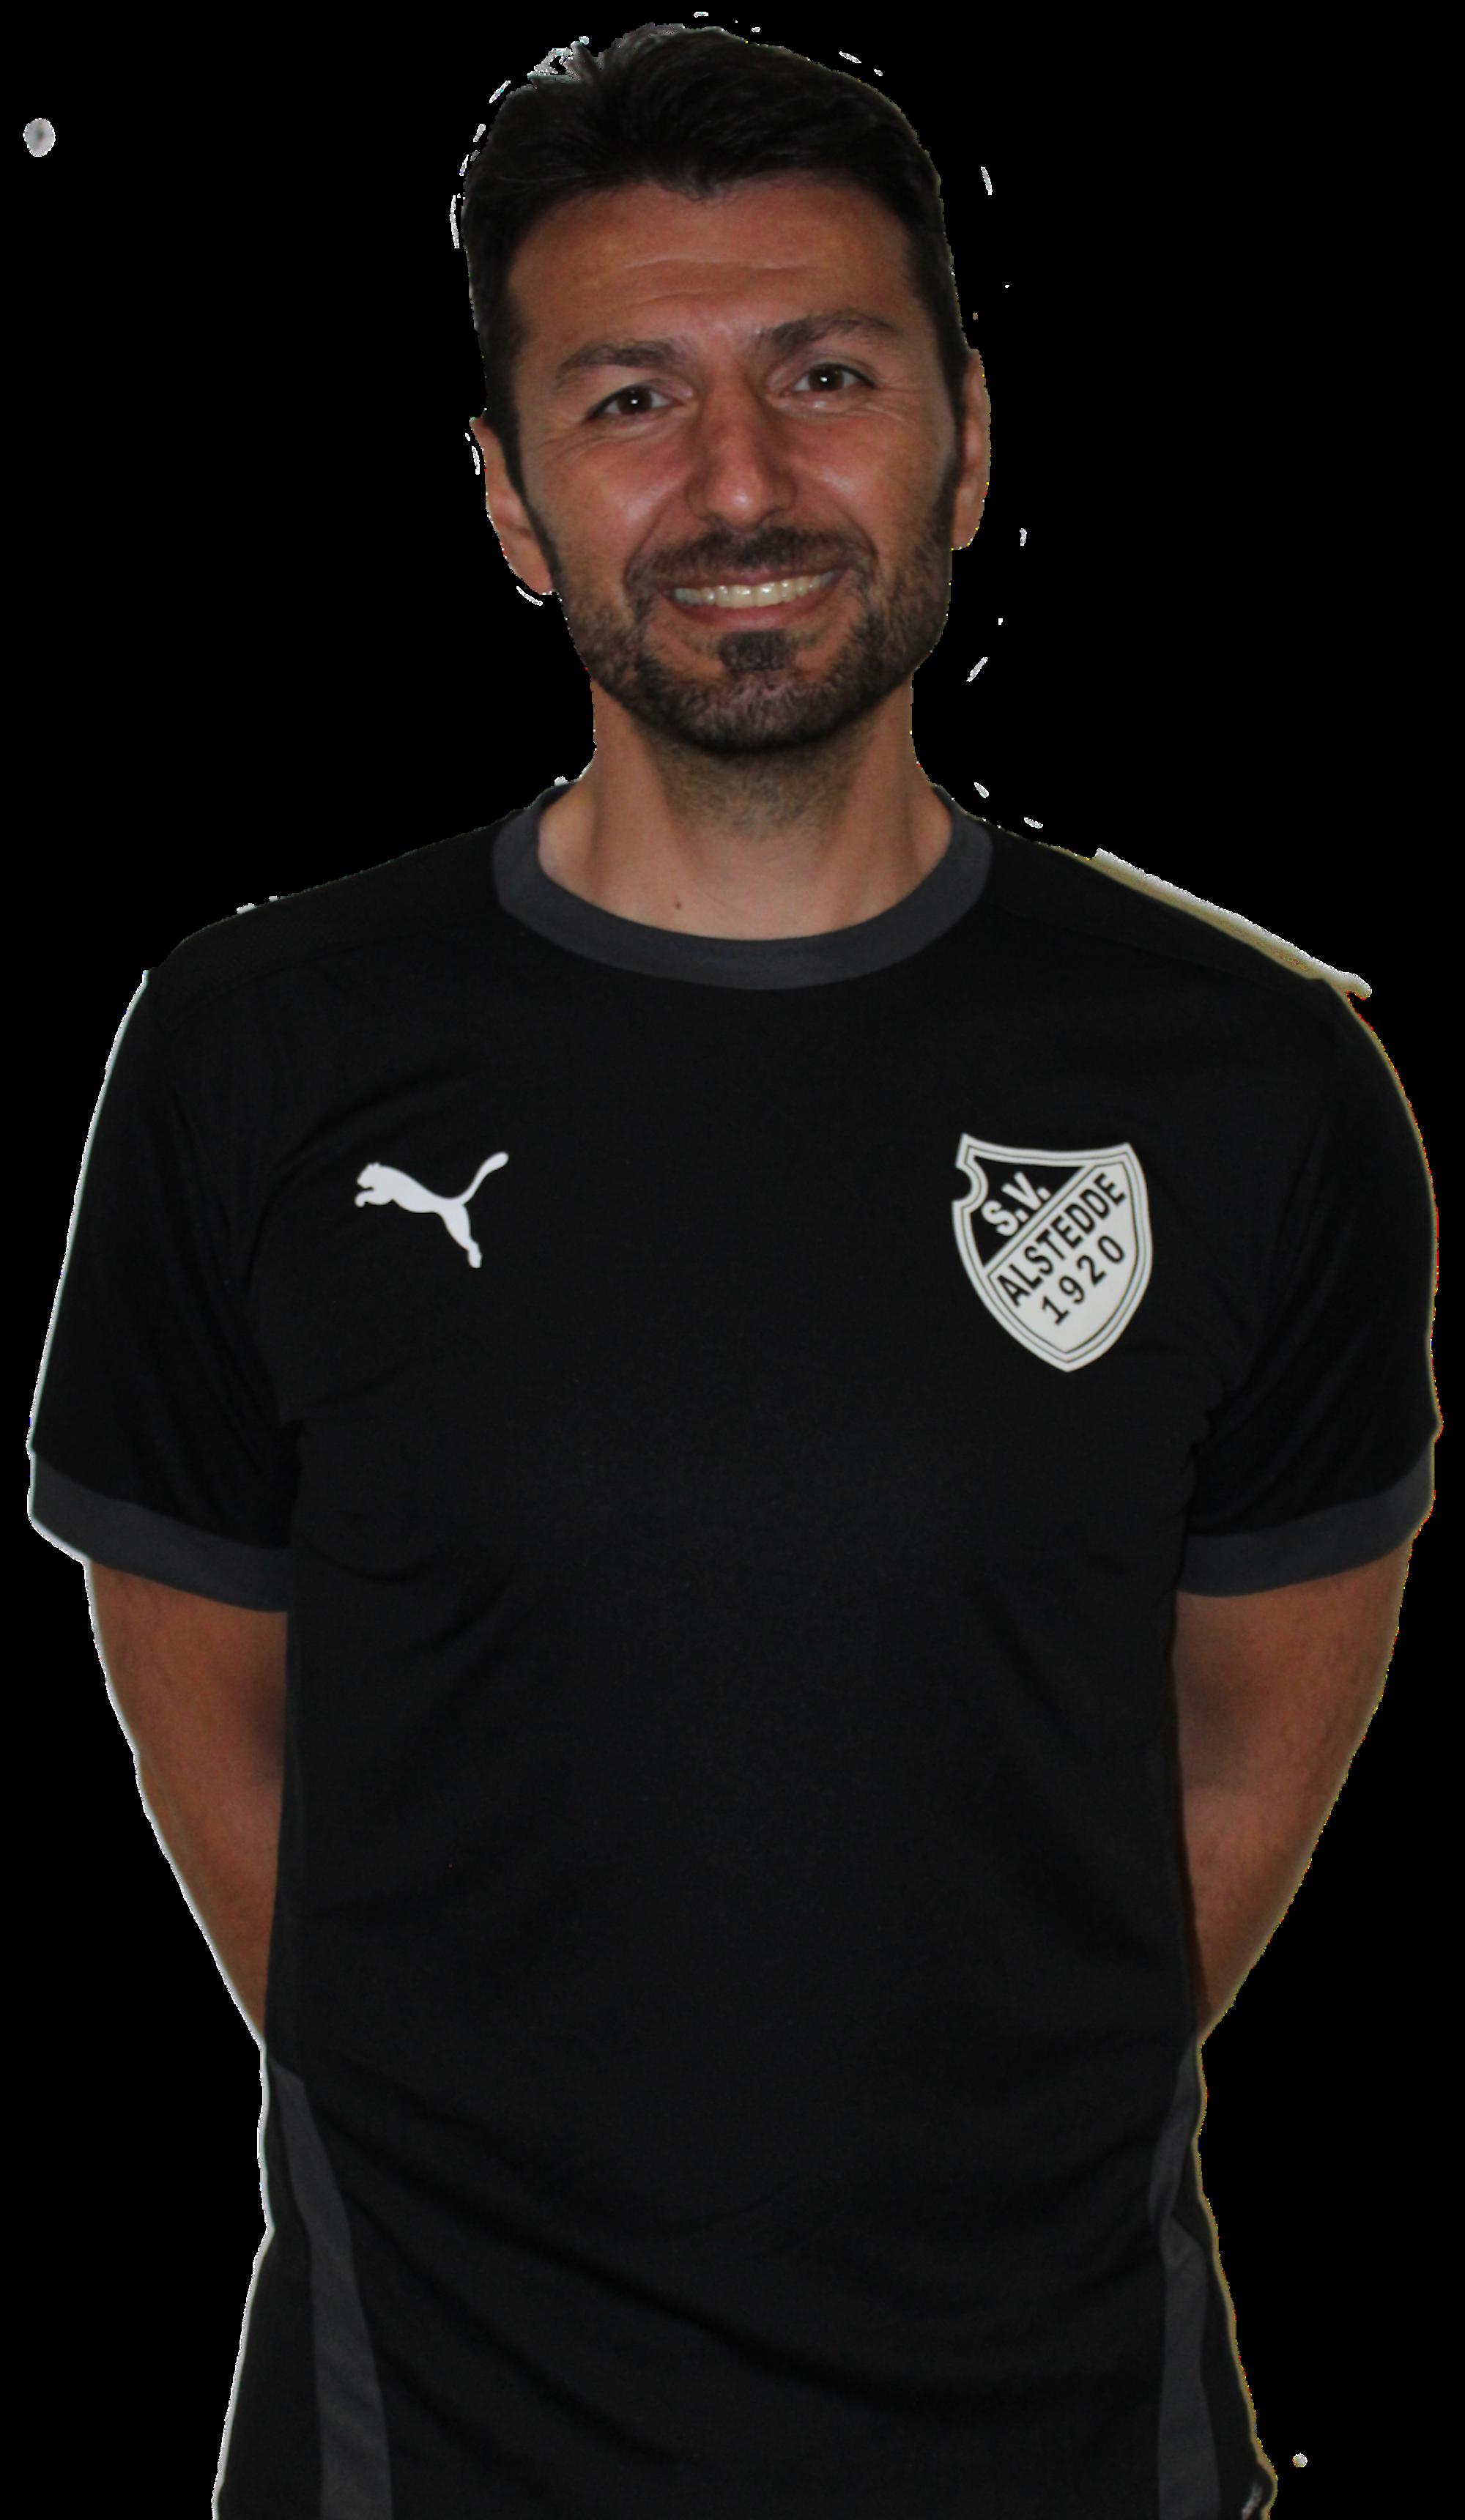 Trainer Fatih Bas